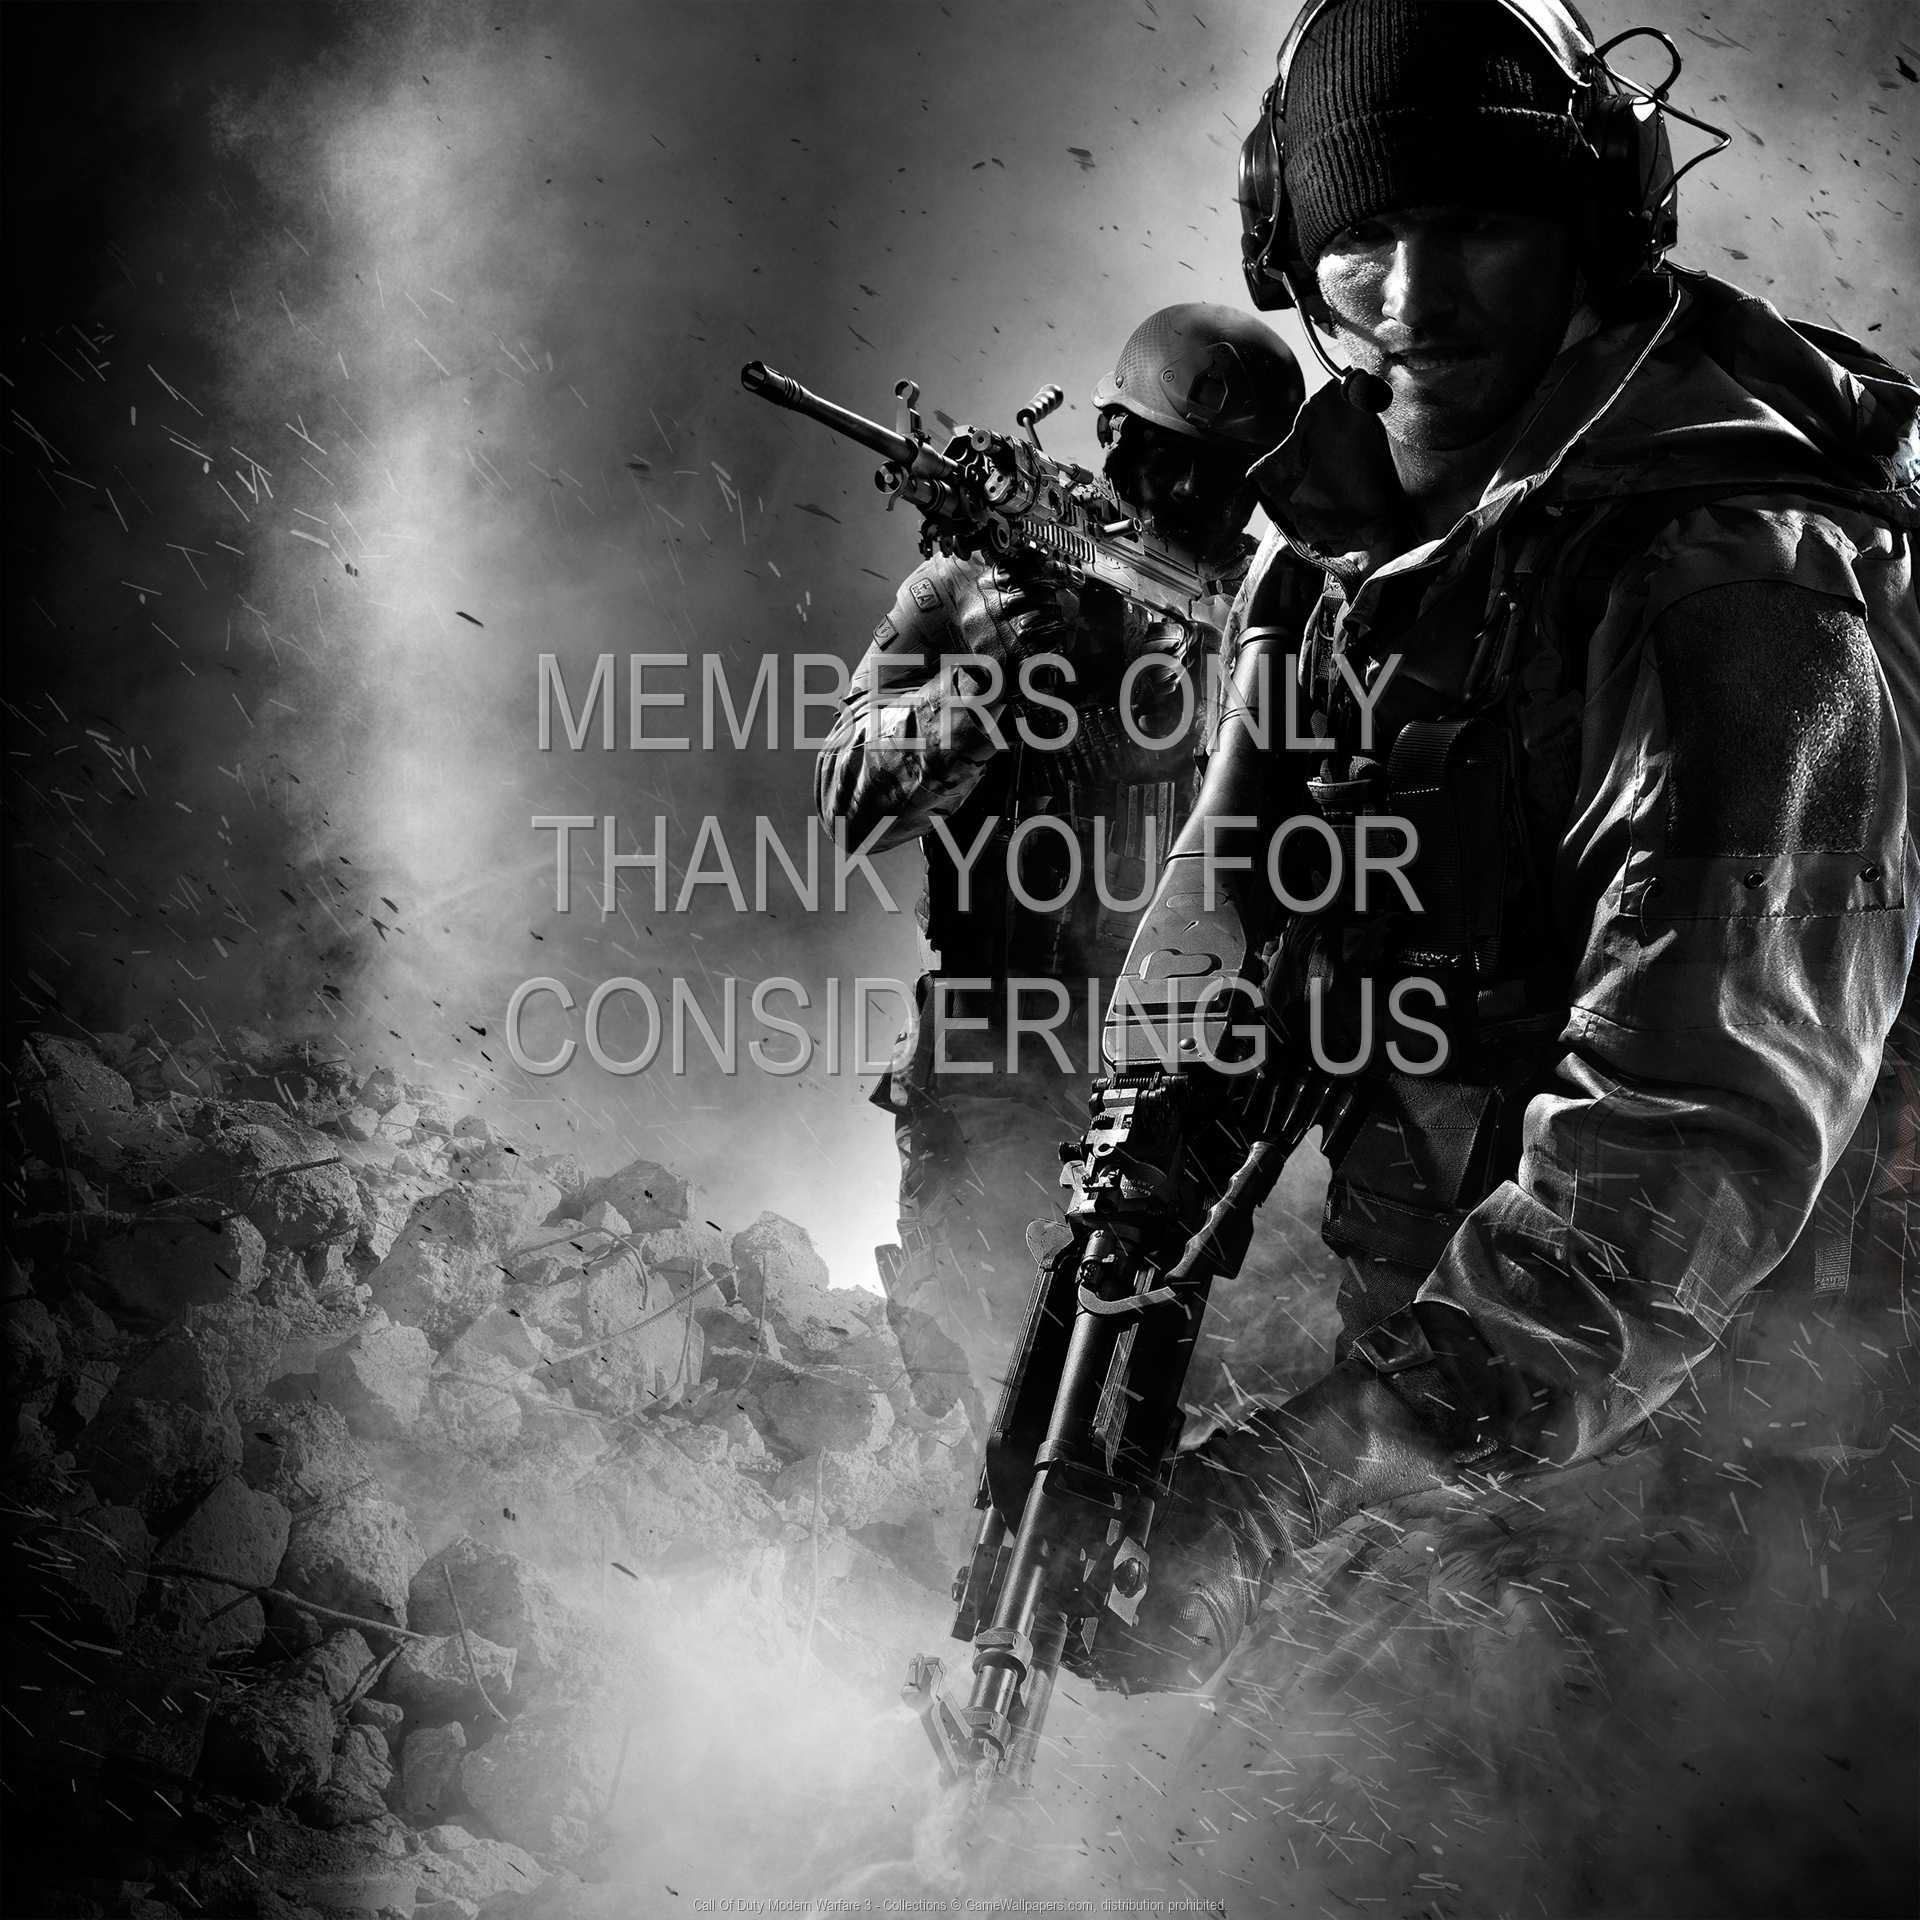 Call Of Duty: Modern Warfare 3 - Collections 1080p Horizontal Handy Hintergrundbild 01